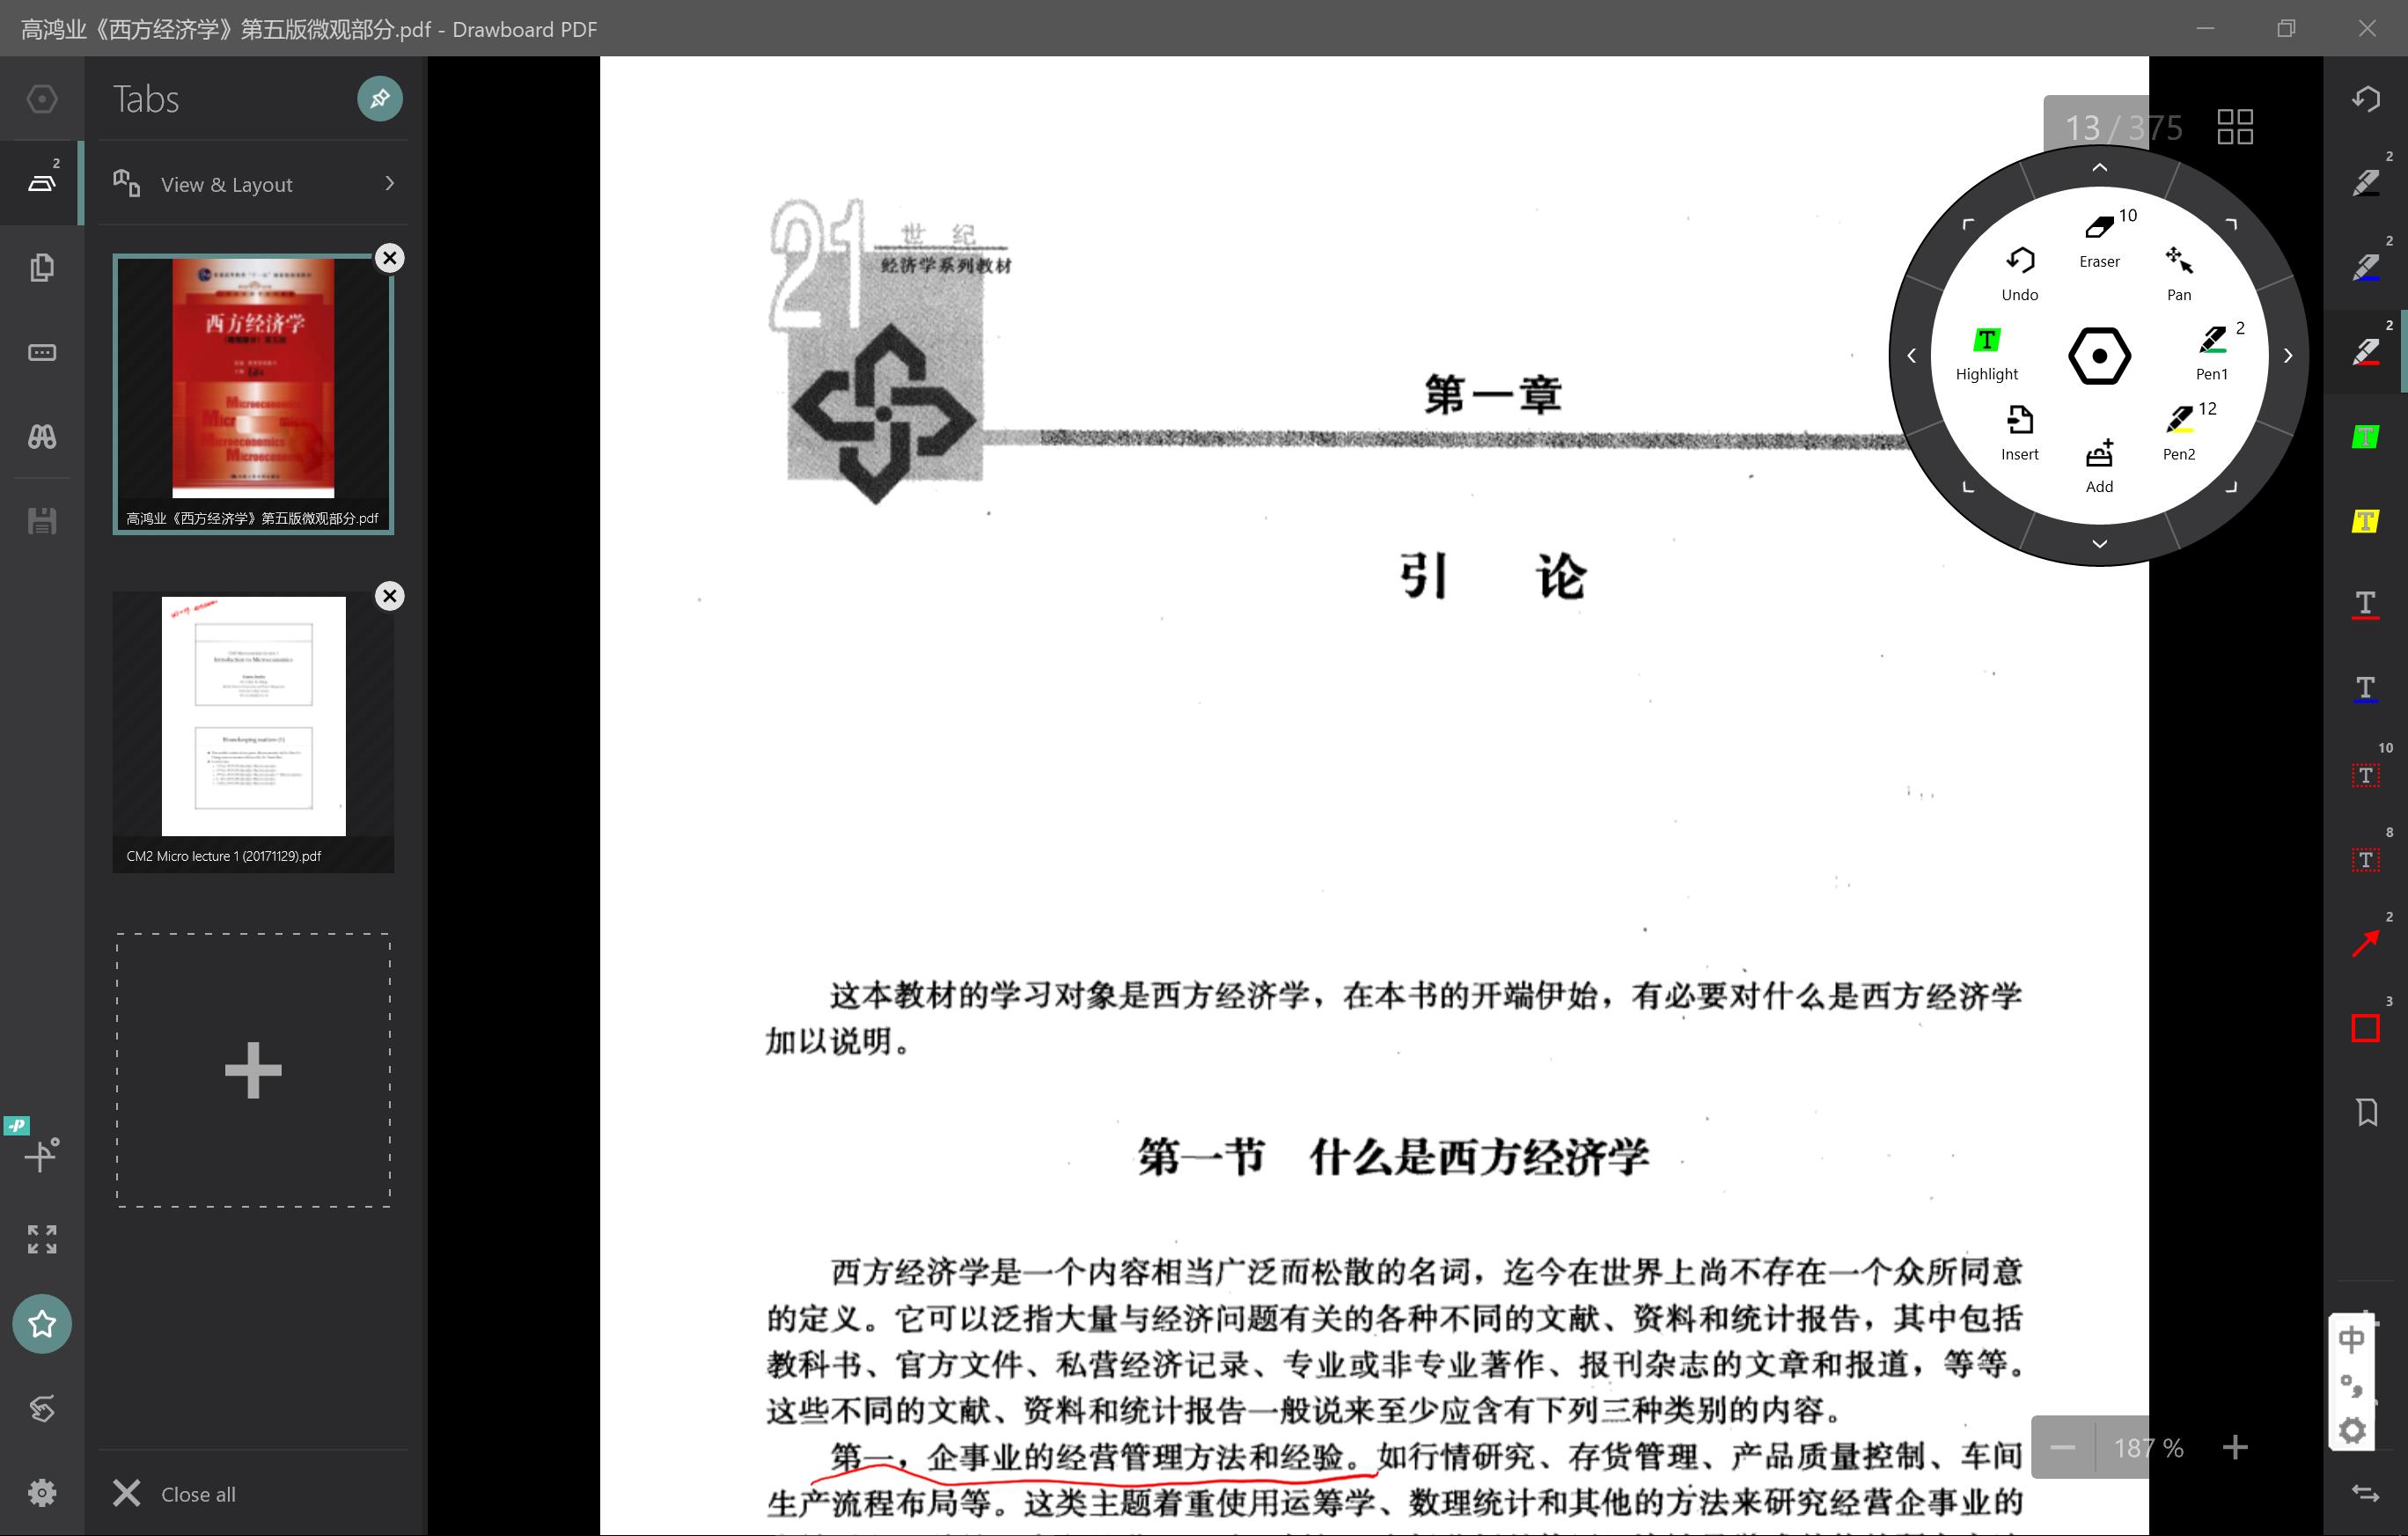 drawboard pdf surface book 2